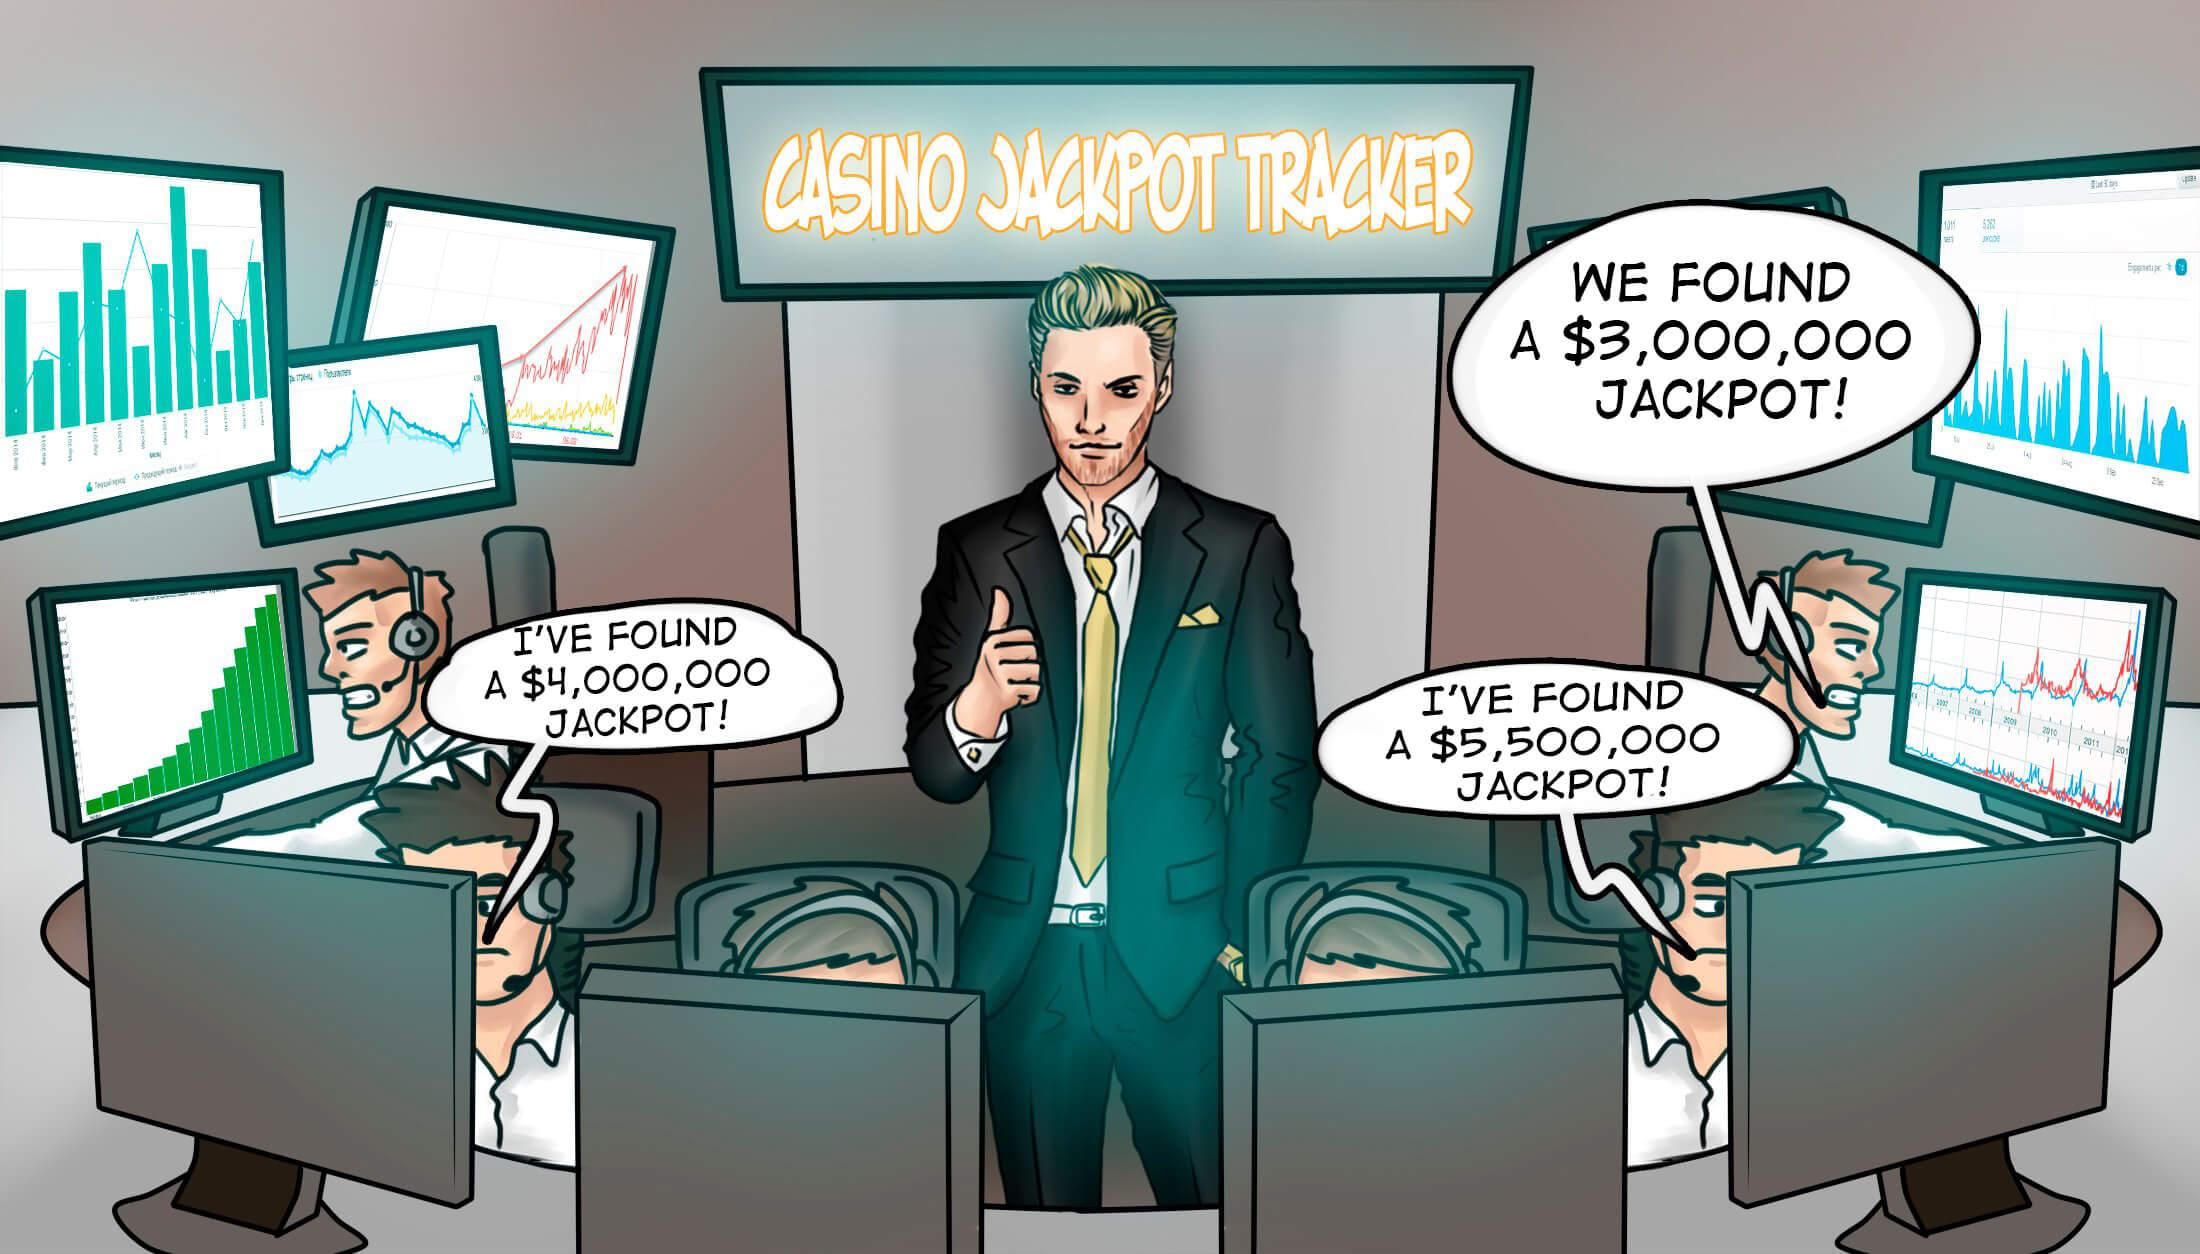 online casino jackpot tracker